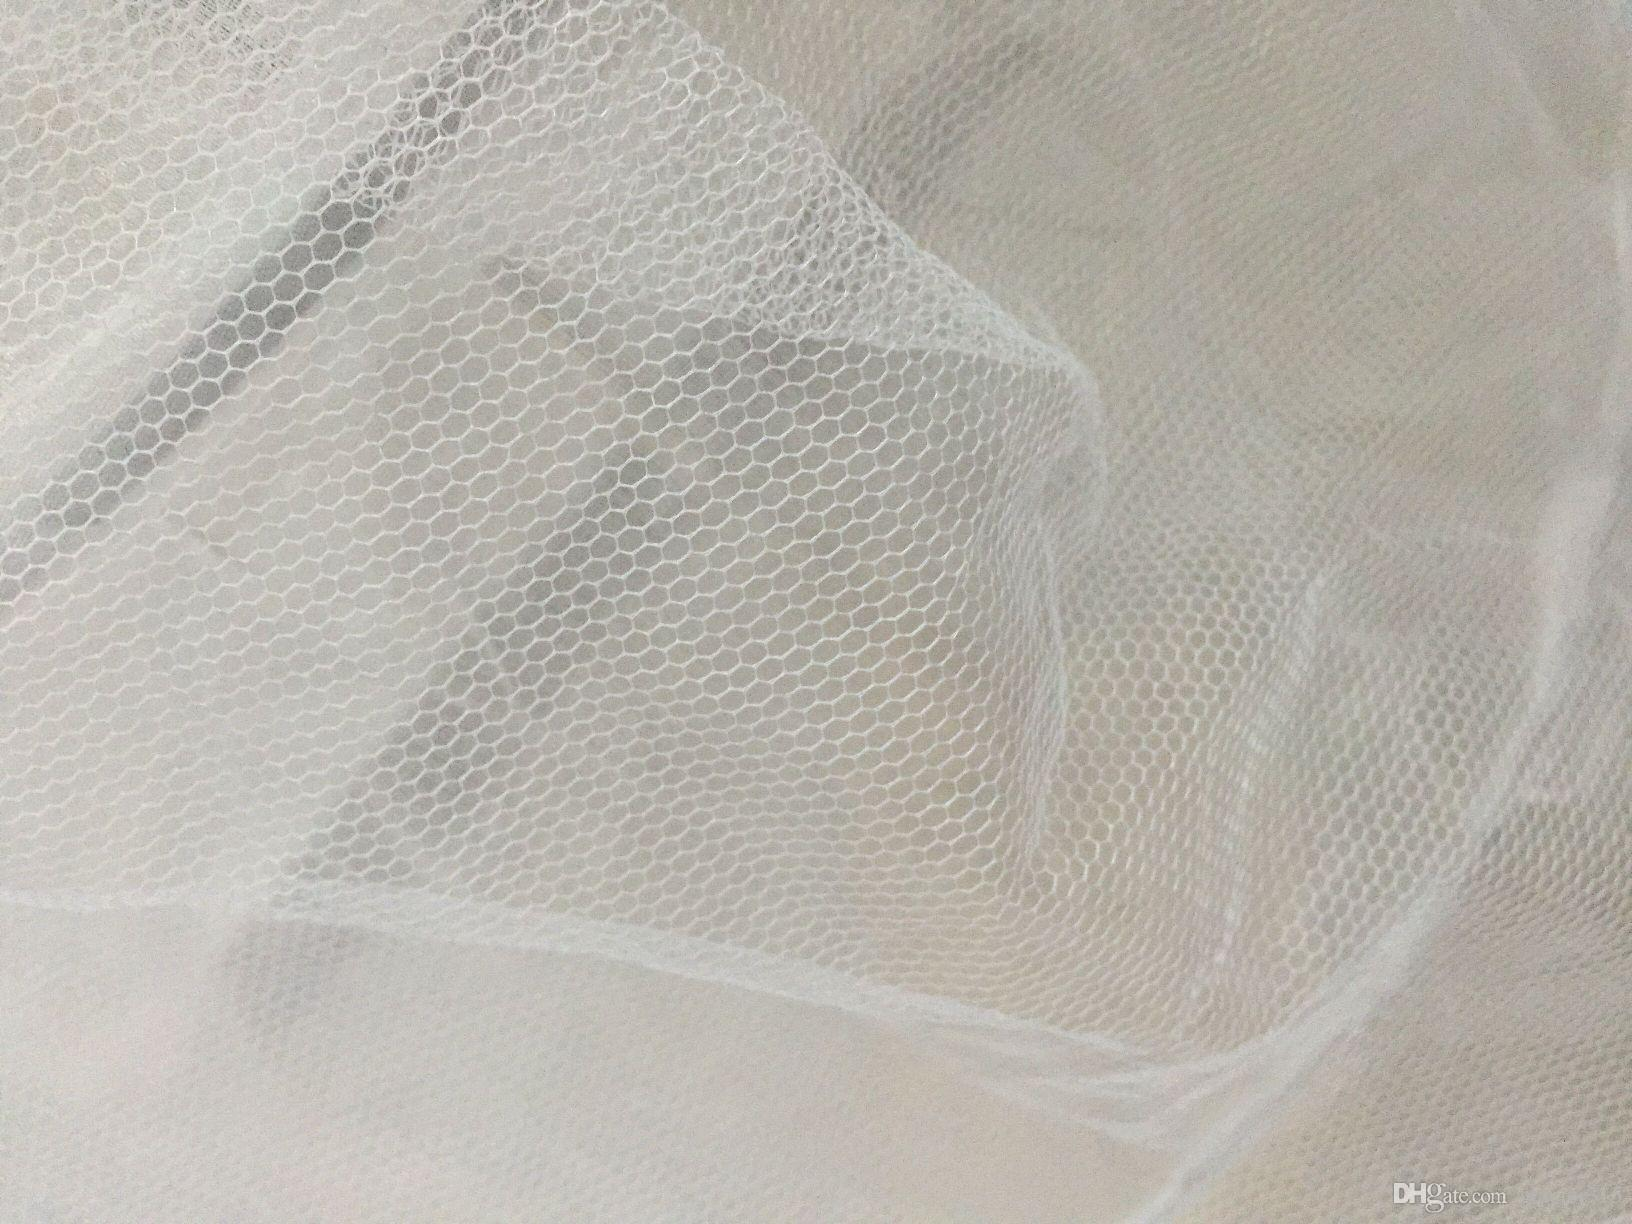 Shanghai Story Hot Sale 3 Hoop Ball Gown Bone Full Crinoline Petticoats For Wedding Dress Wedding Skirt Accessories Slip QC-01